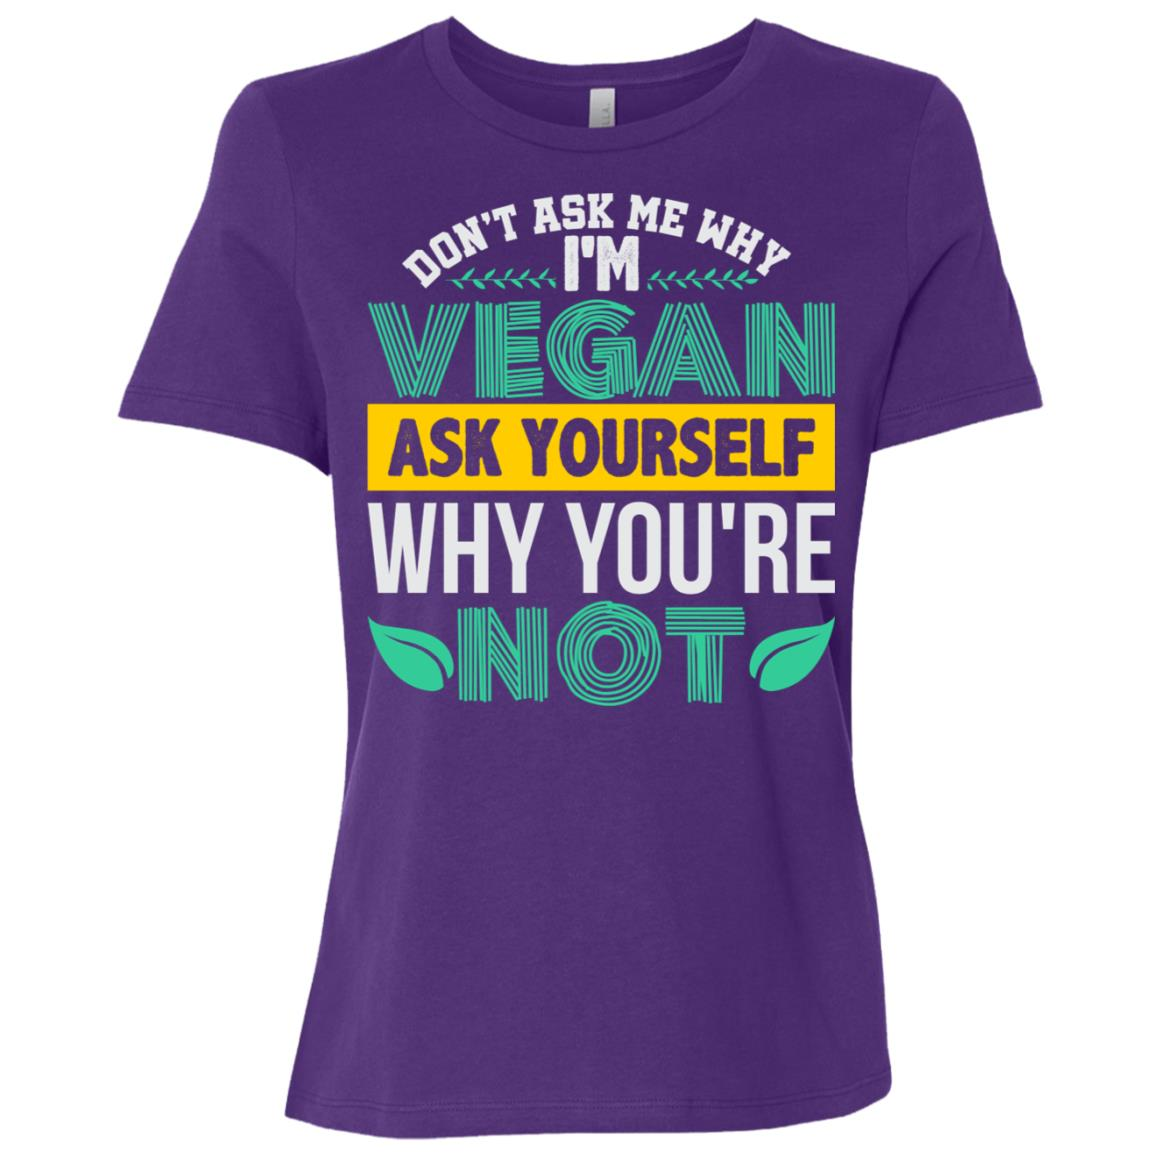 Funny Vegan Vegetarian Gifts For Men Women Women Short Sleeve T-Shirt